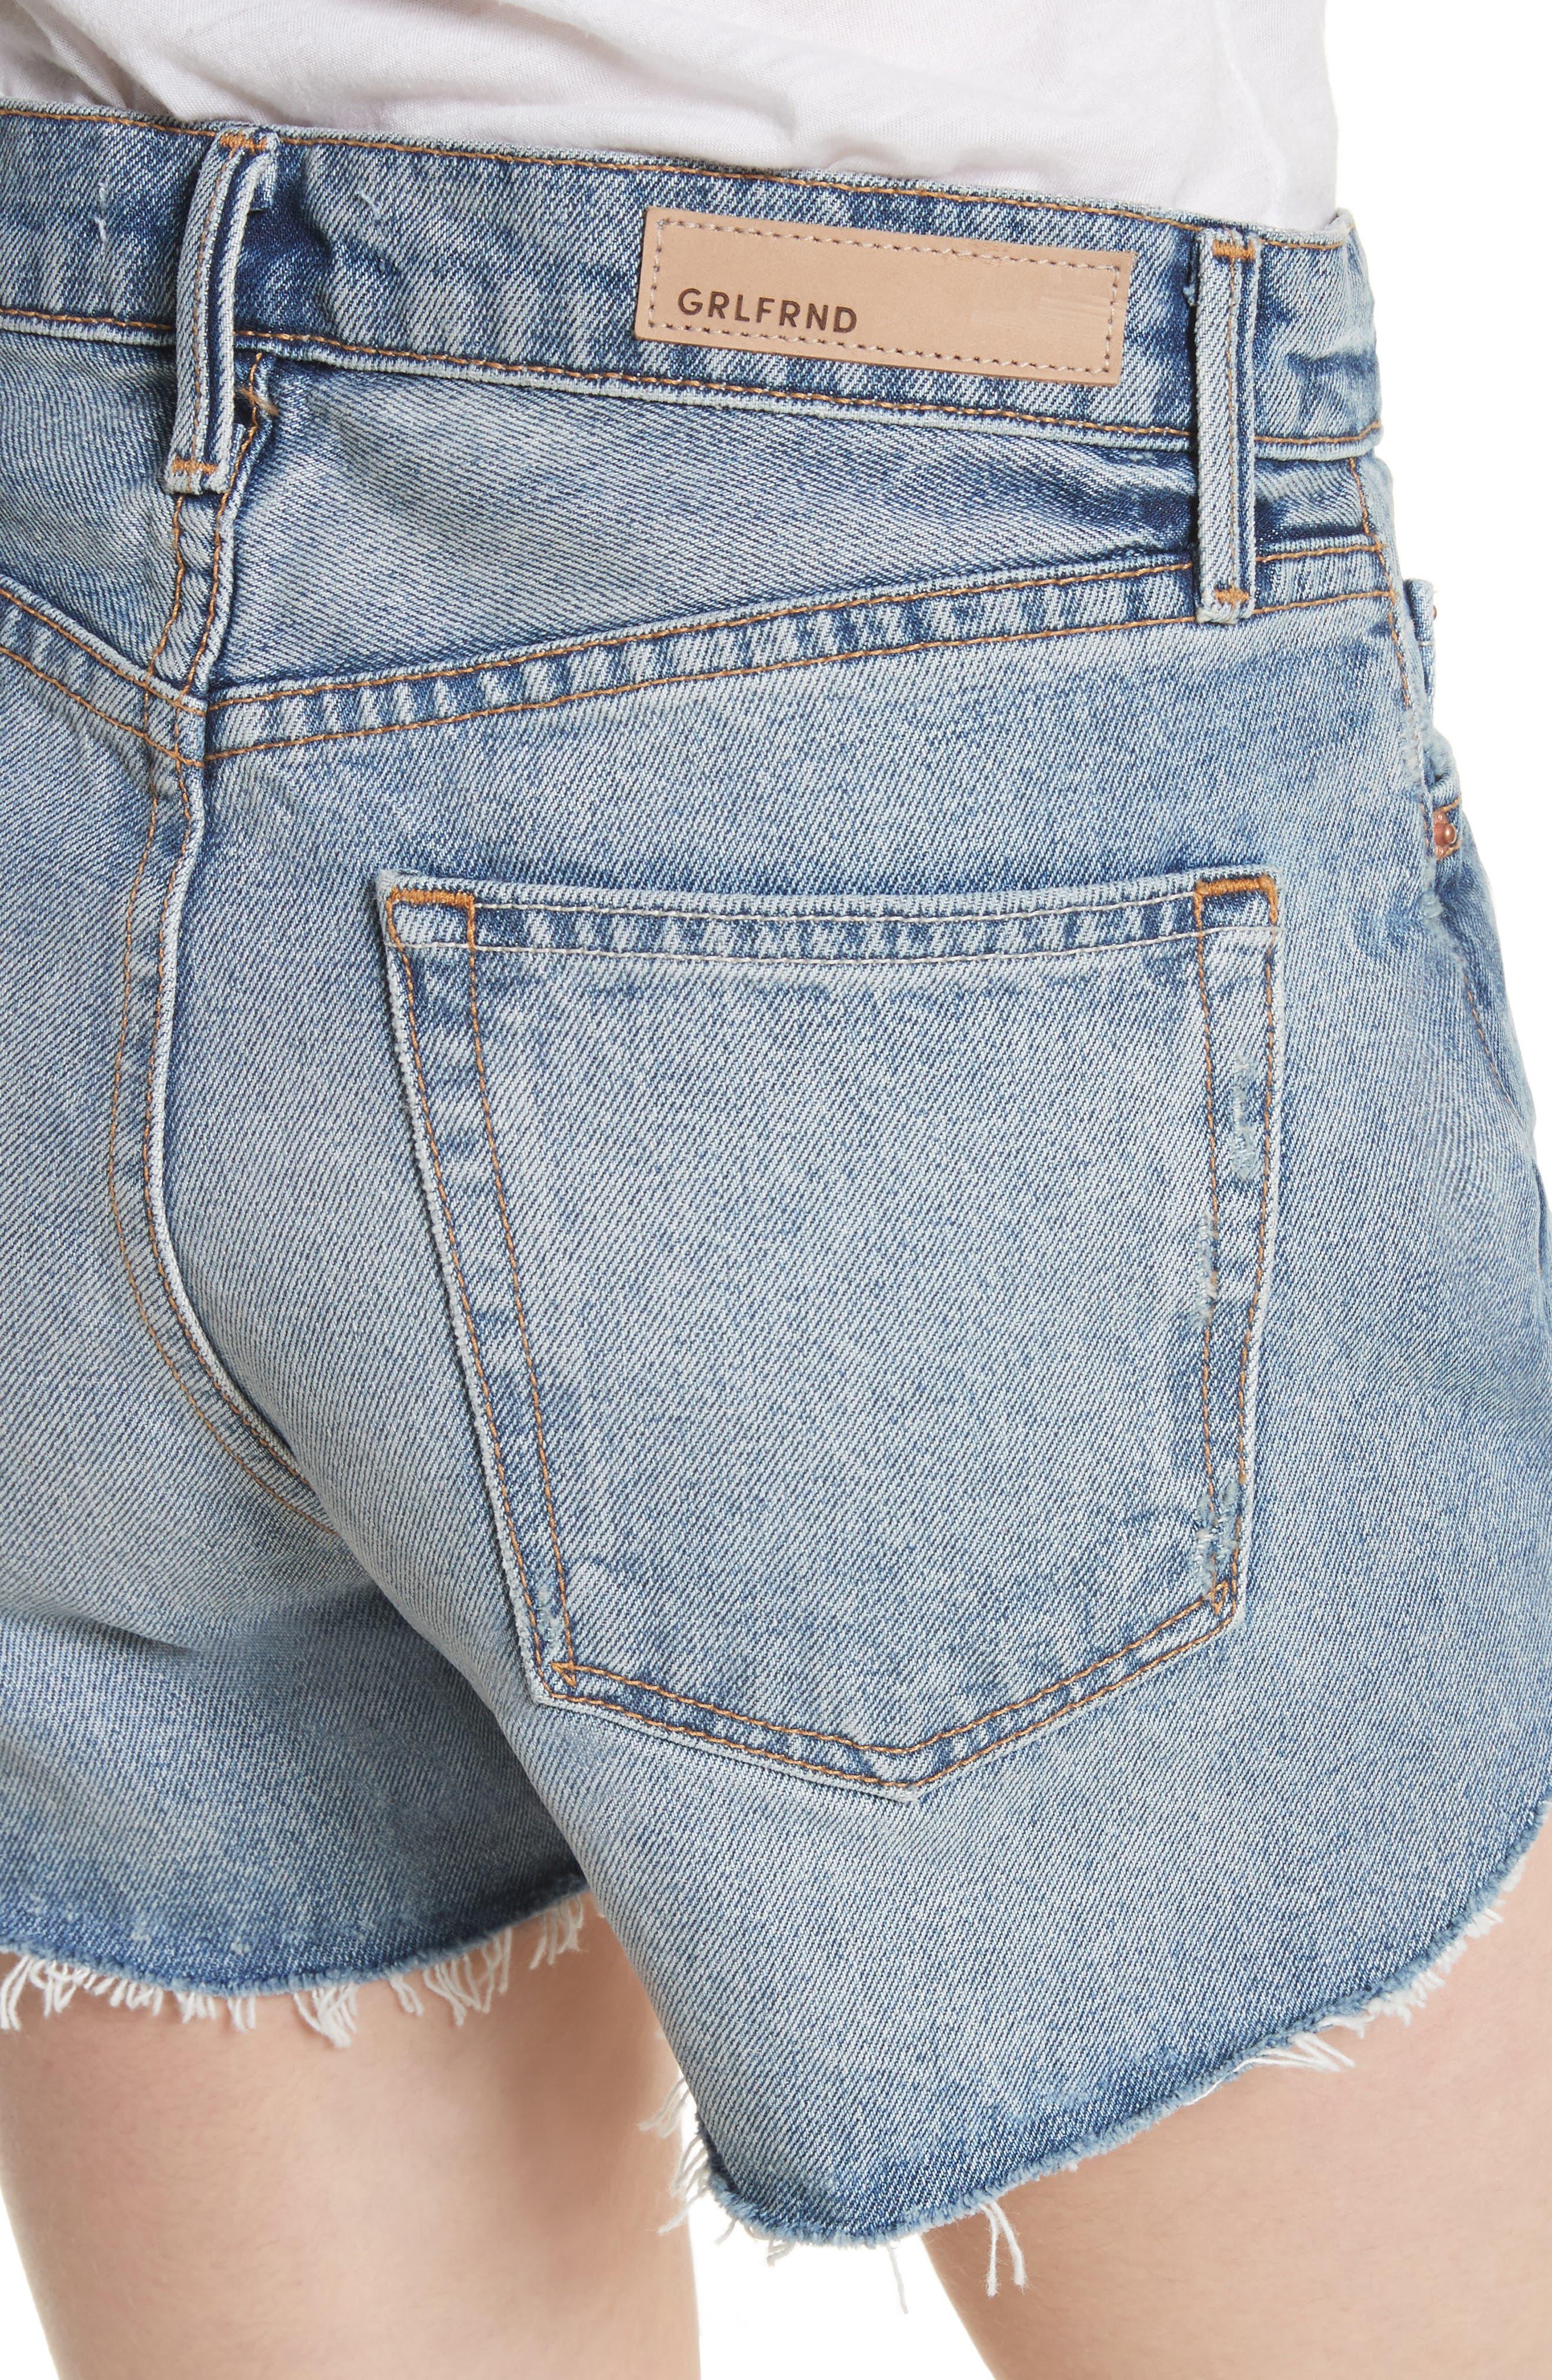 Mardee Denim Shorts,                             Alternate thumbnail 4, color,                             491